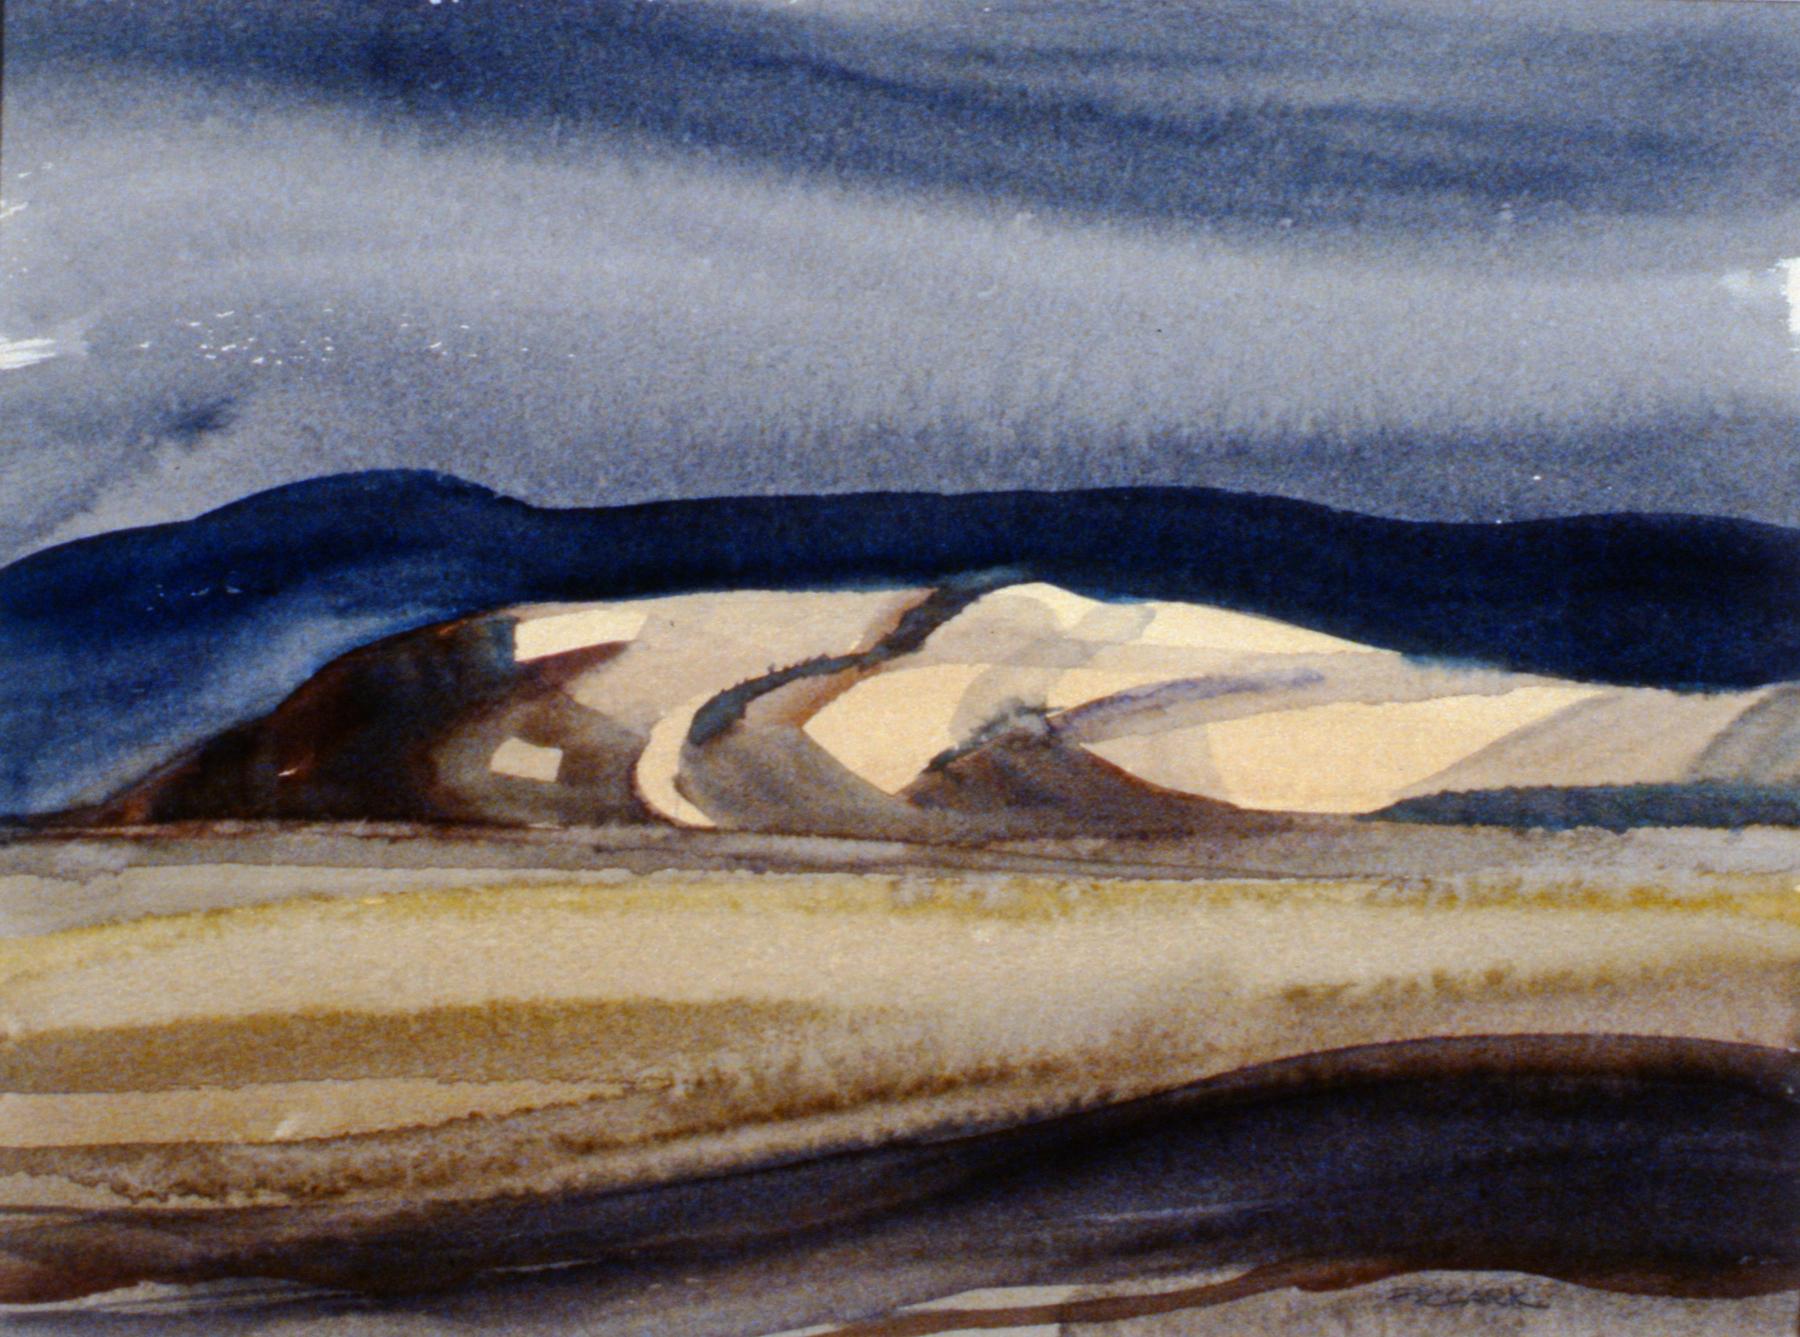 Ranchland (Sketch #2) , n.d., Phil Clark, watercolour on paper, 29.2 cm x 21.6 cm, 1988.01.01. Gift of Eileen Railton.